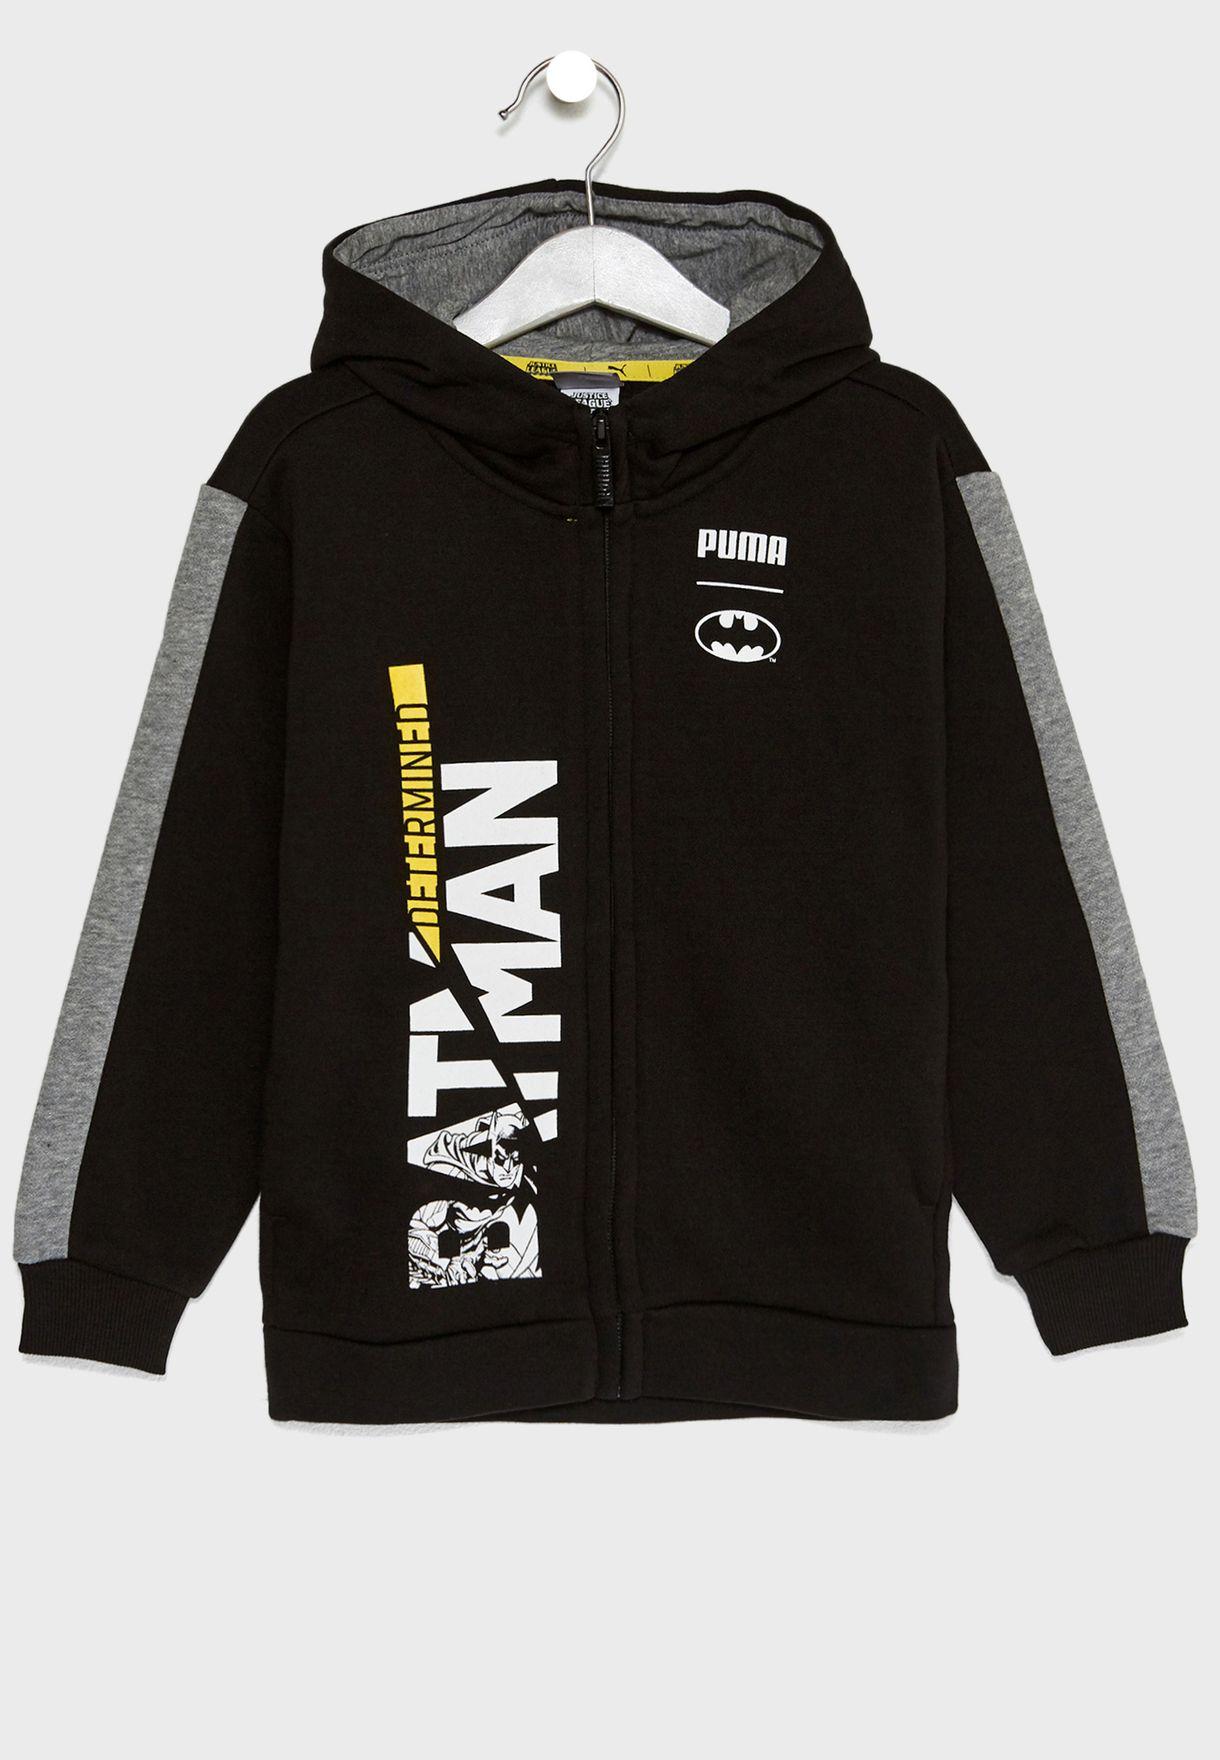 Black Hoodie Puma Shop Batman For 85203501 Kuwait Kids In zwvI5BIq4